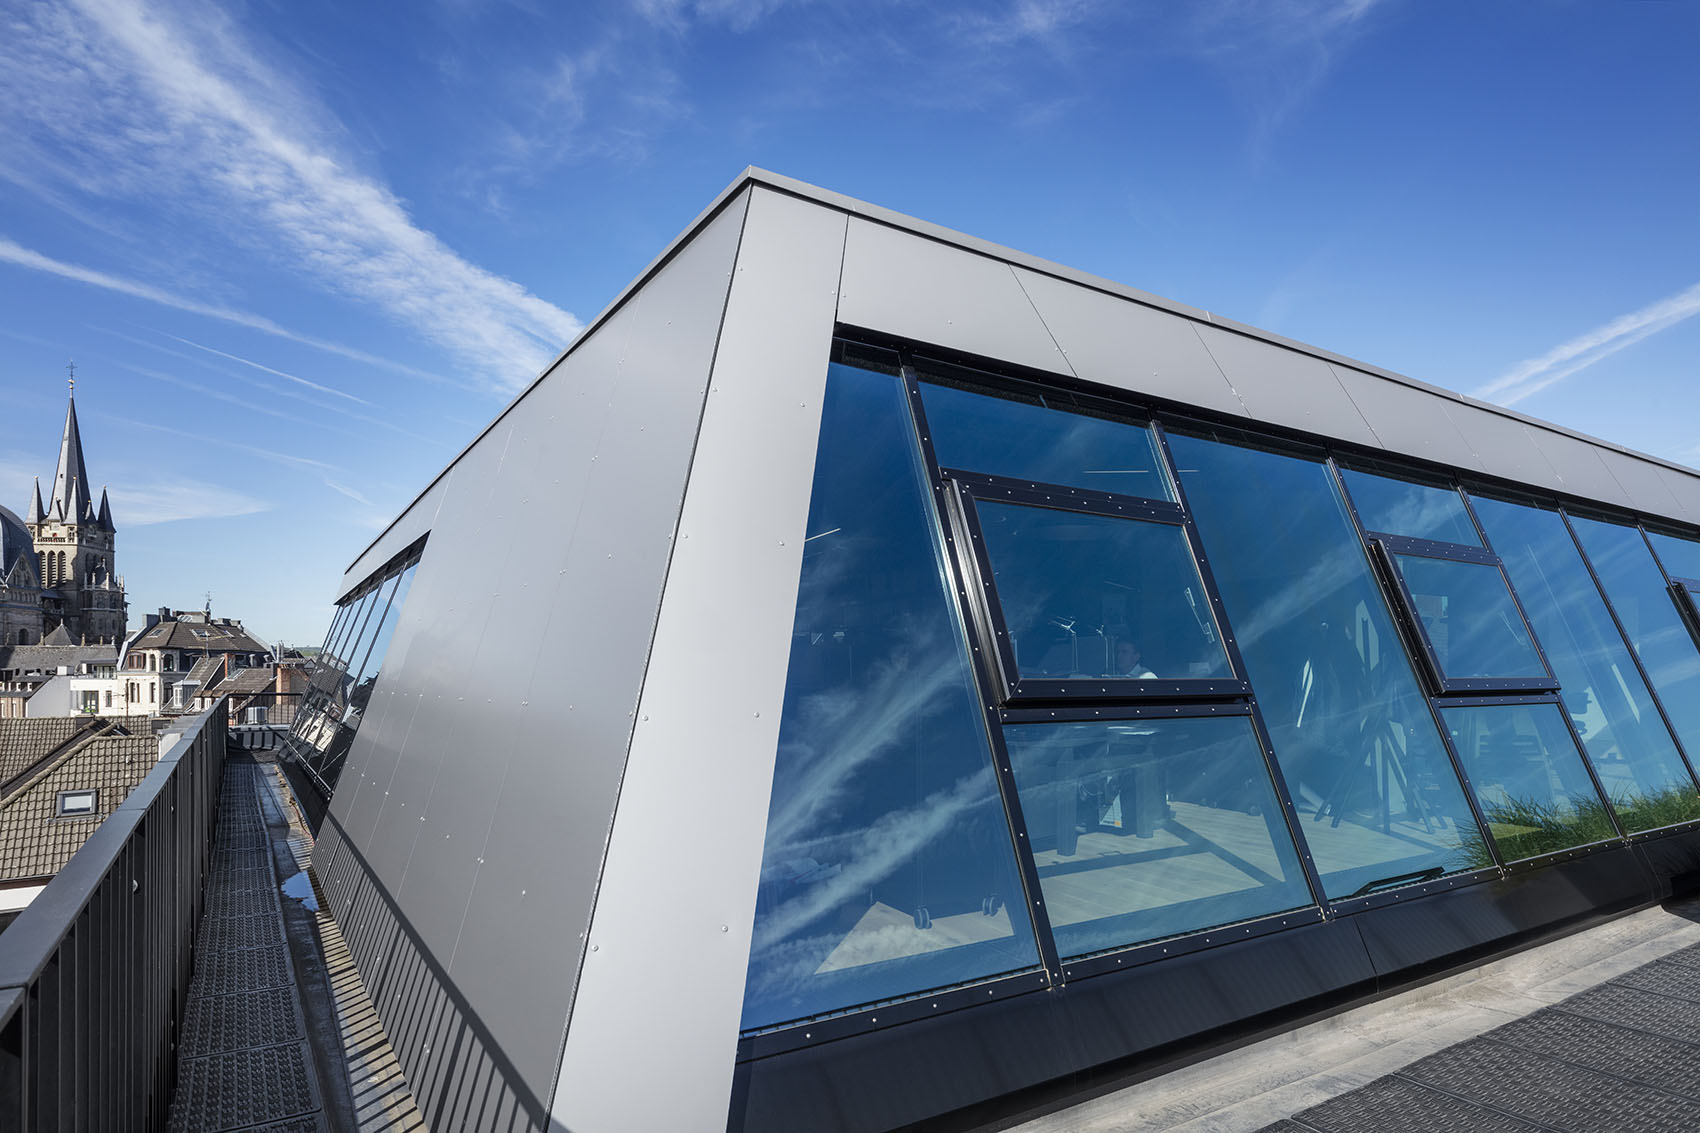 6_Rooftop-Office-Aachen_CROSS-Architecture.jpg